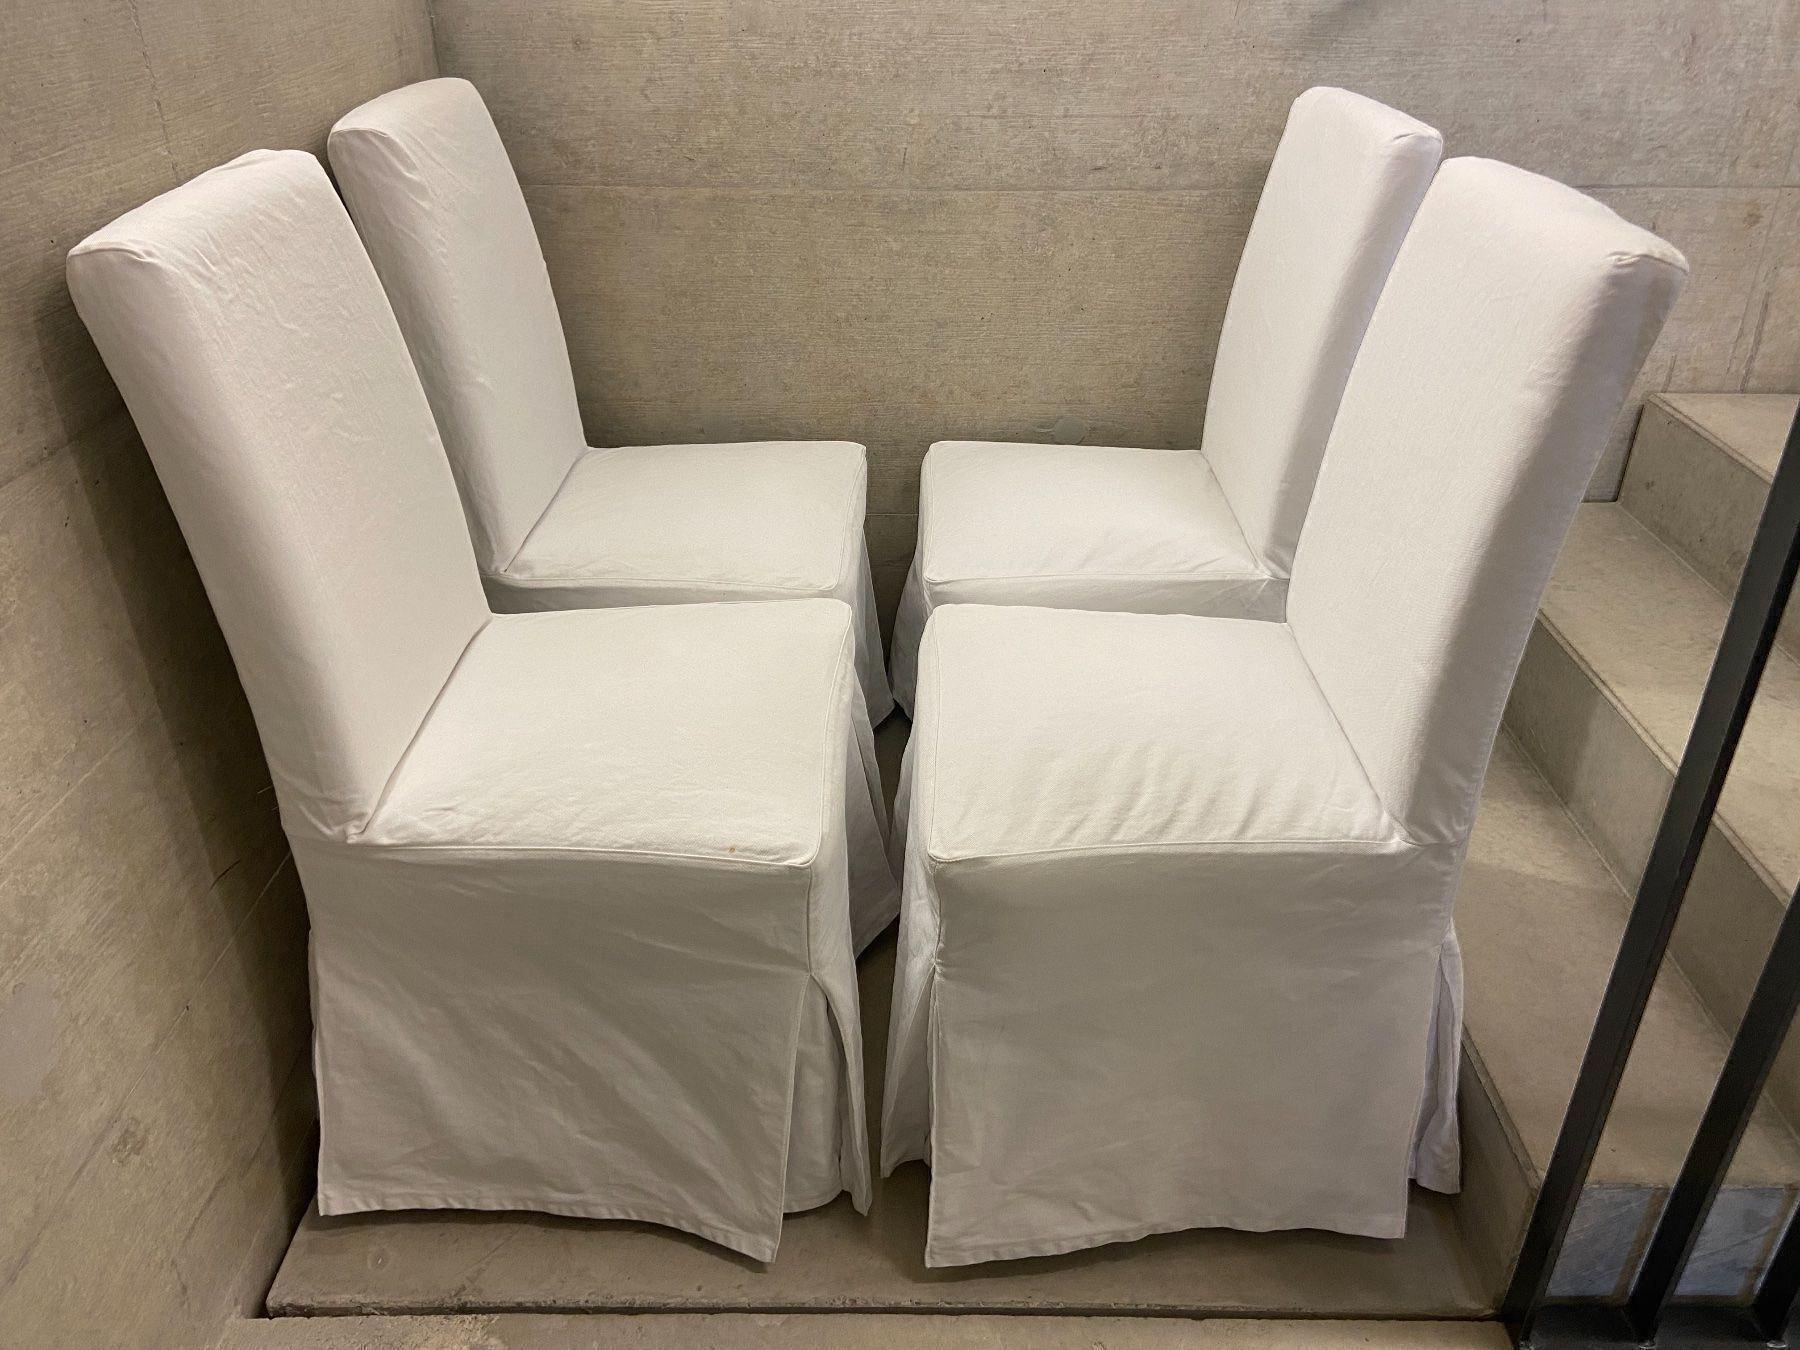 Stühle Ikea Weiß